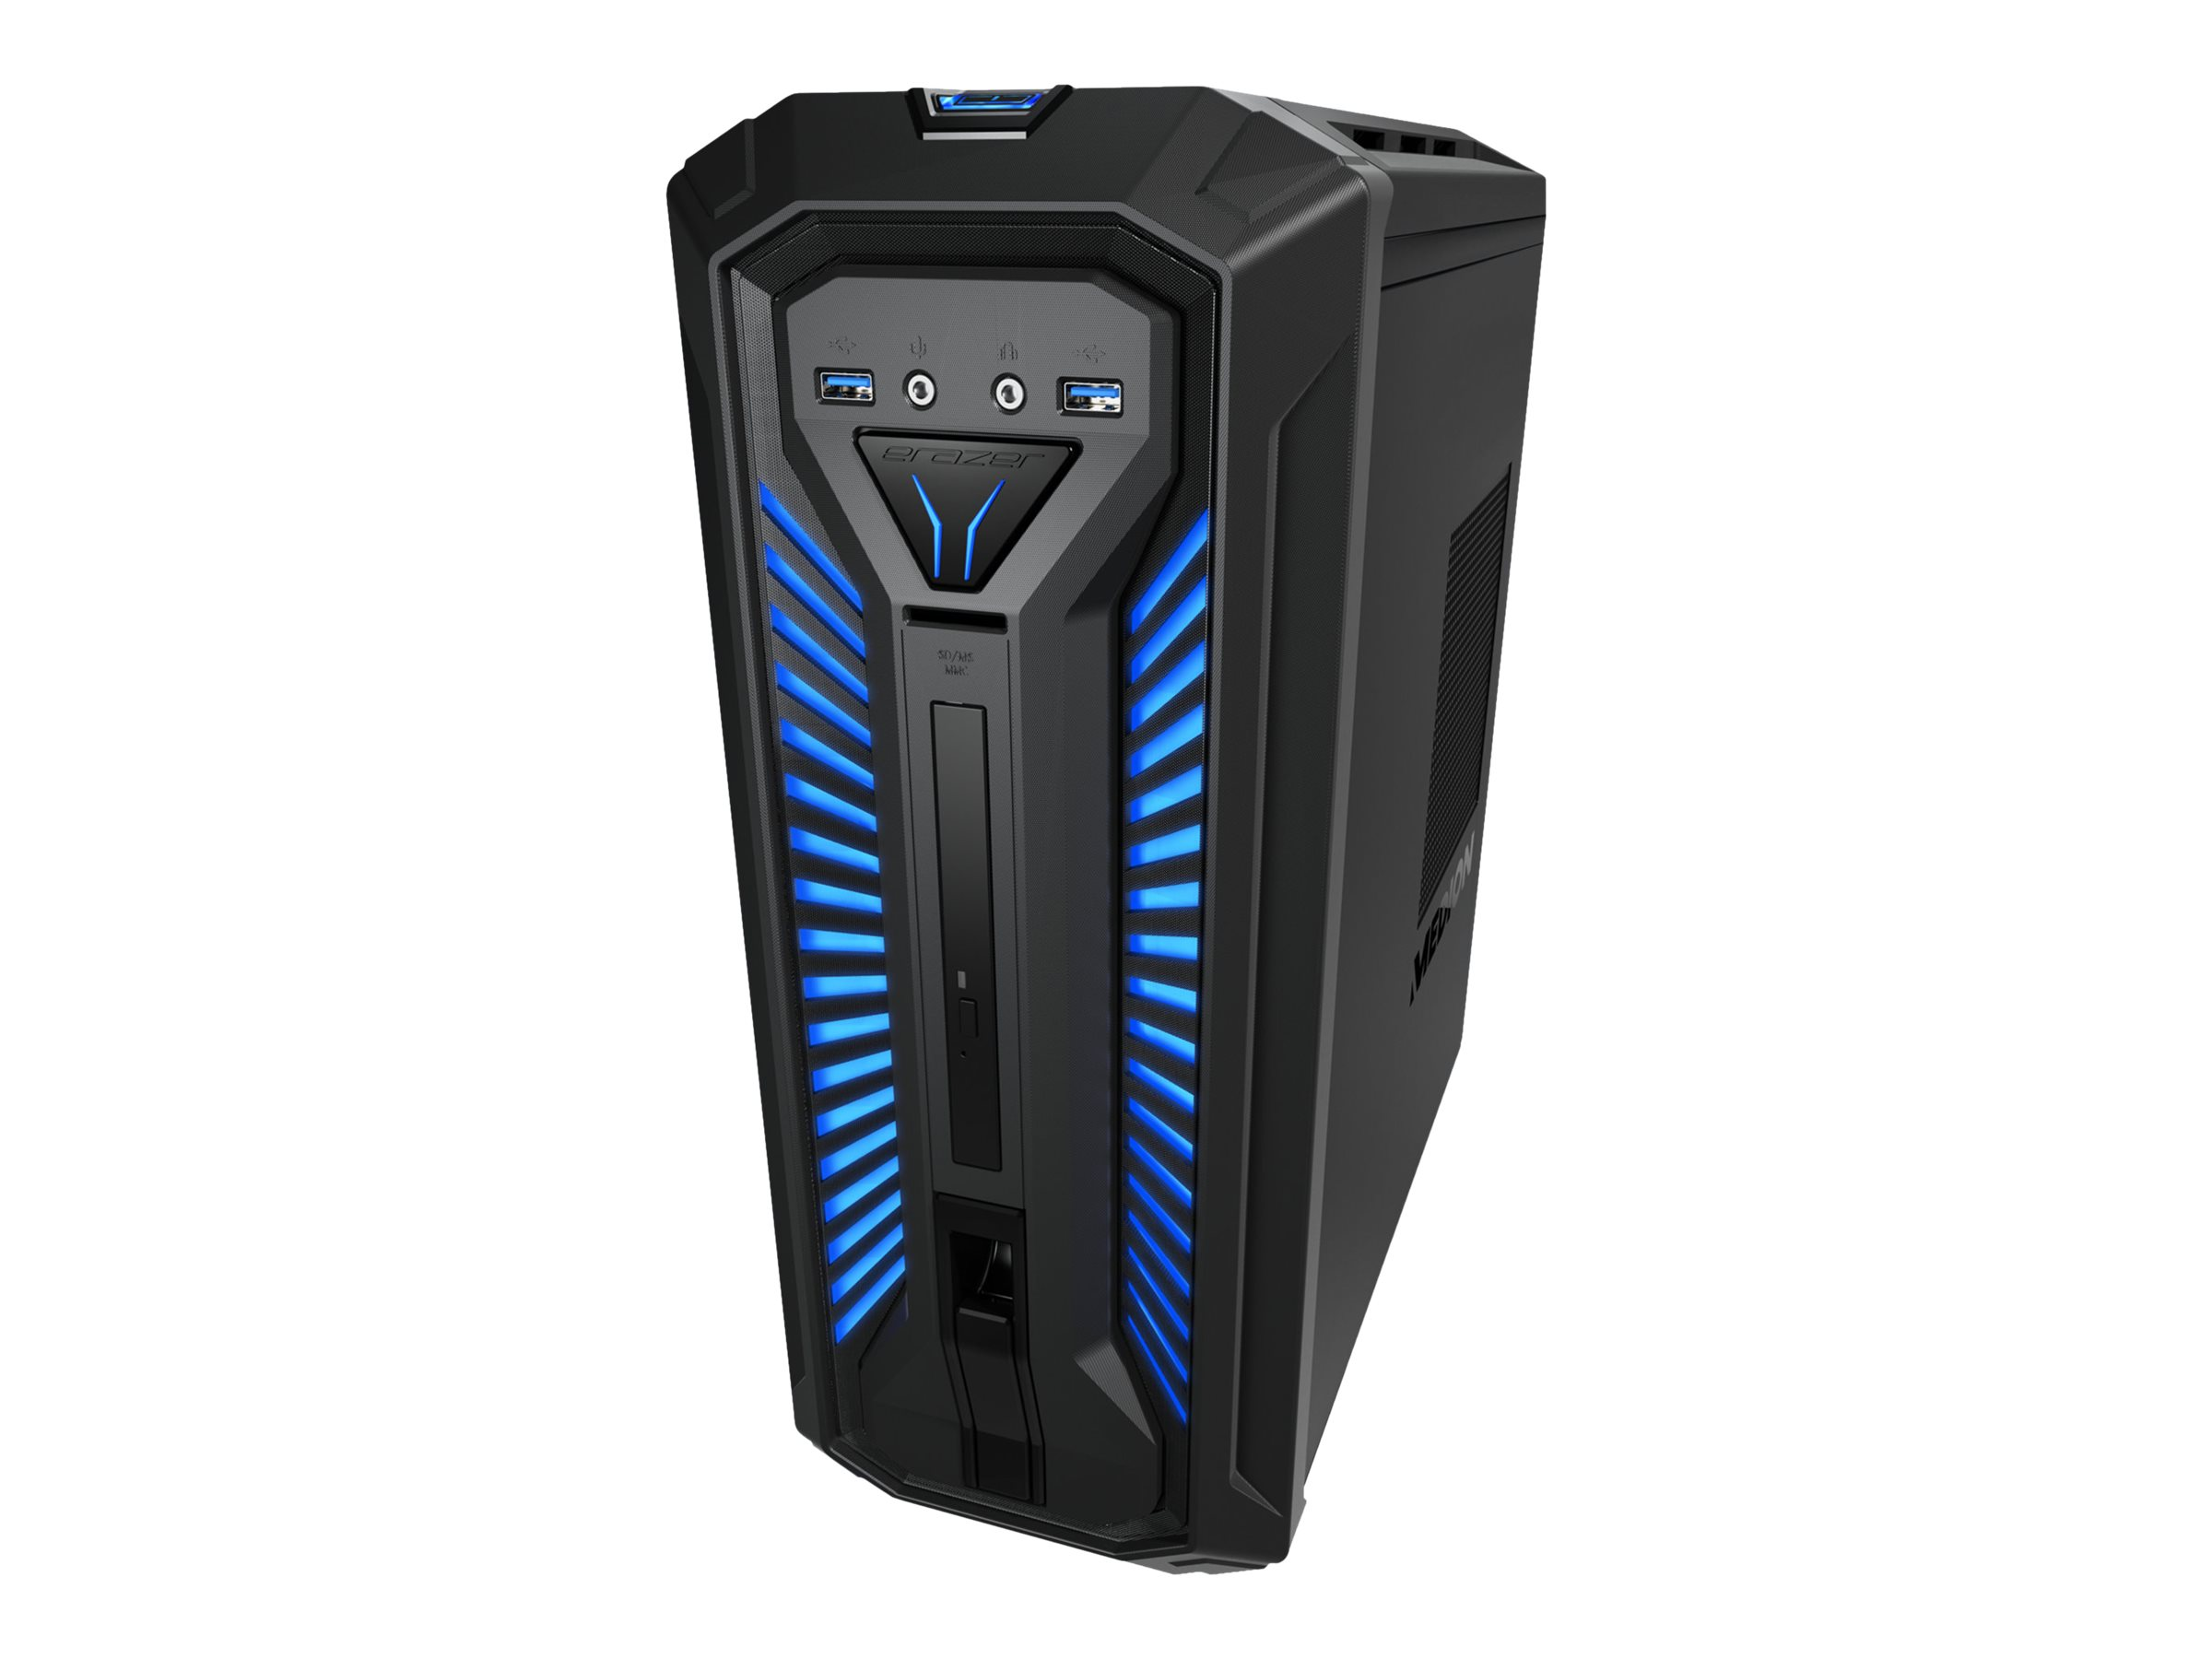 Medion ERAZER X67105 - Tower - 1 x Core i5 9400 / 2.9 GHz - RAM 16 GB - SSD 256 GB, HDD 1 TB - DVD-Writer